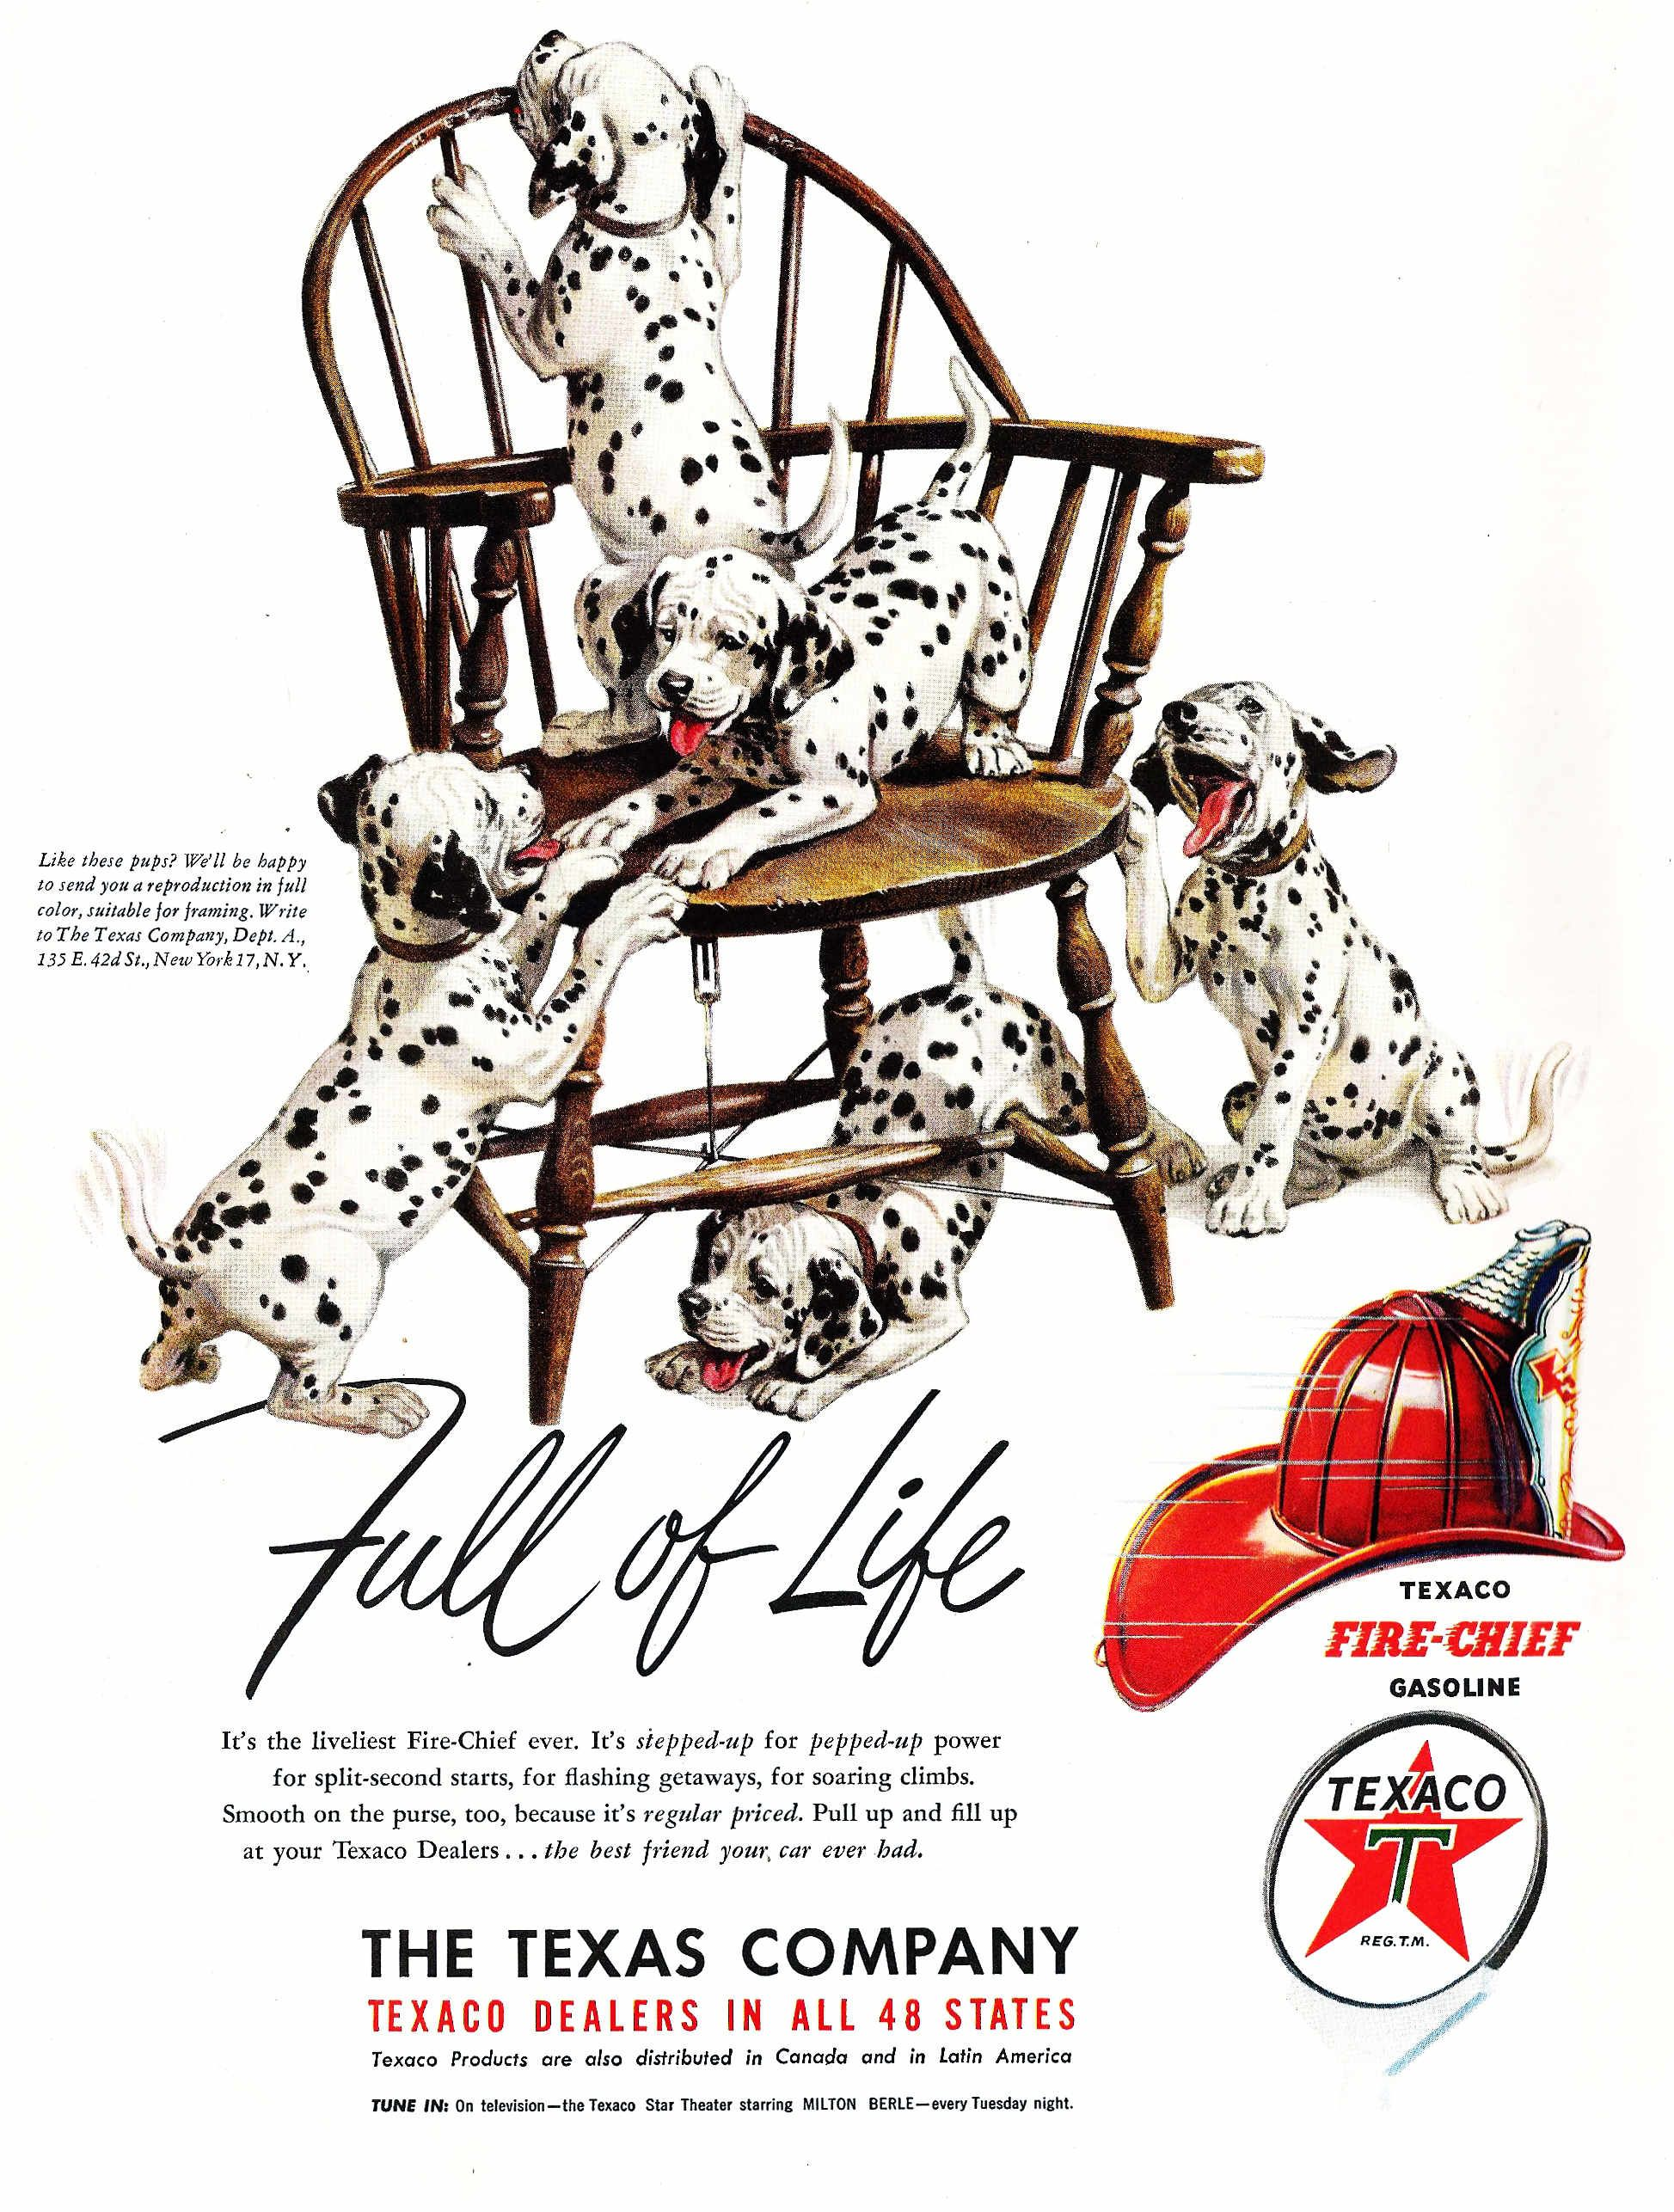 Texaco ad from the early 1950's. Texaco, Vintage ads